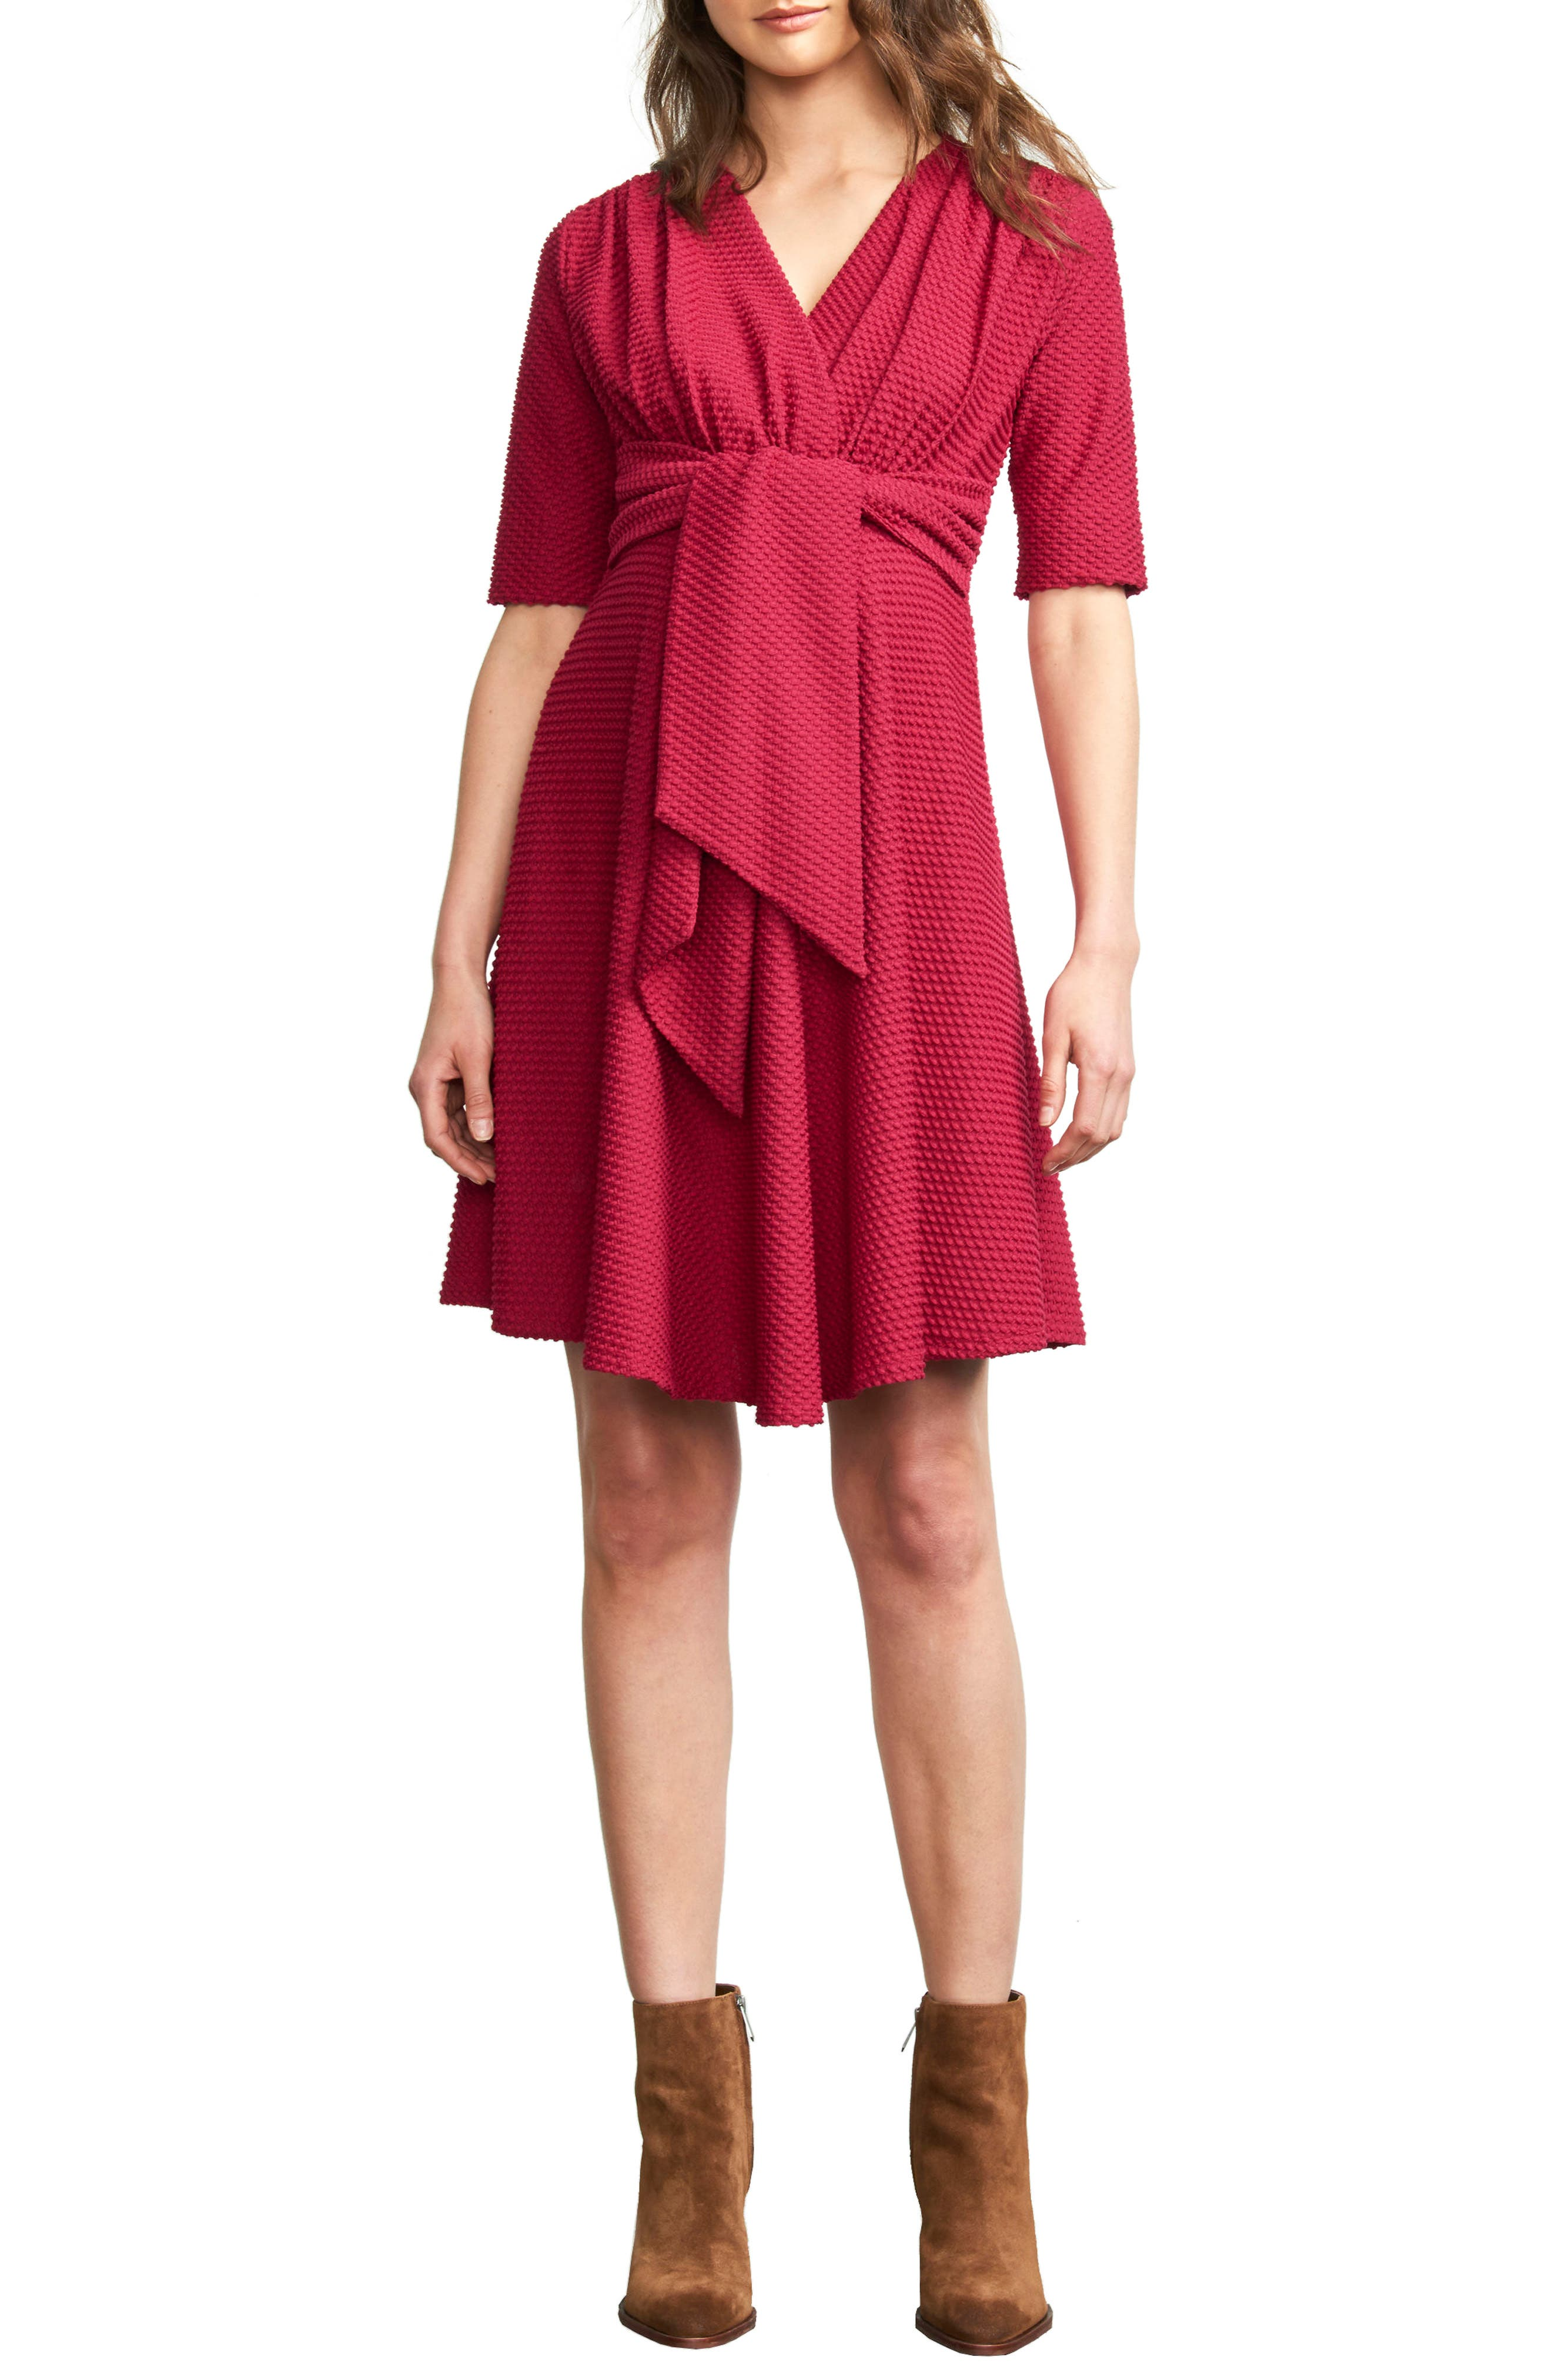 MATERNAL AMERICA, Tie Waist Maternity Dress, Main thumbnail 1, color, MAGENTA PINK